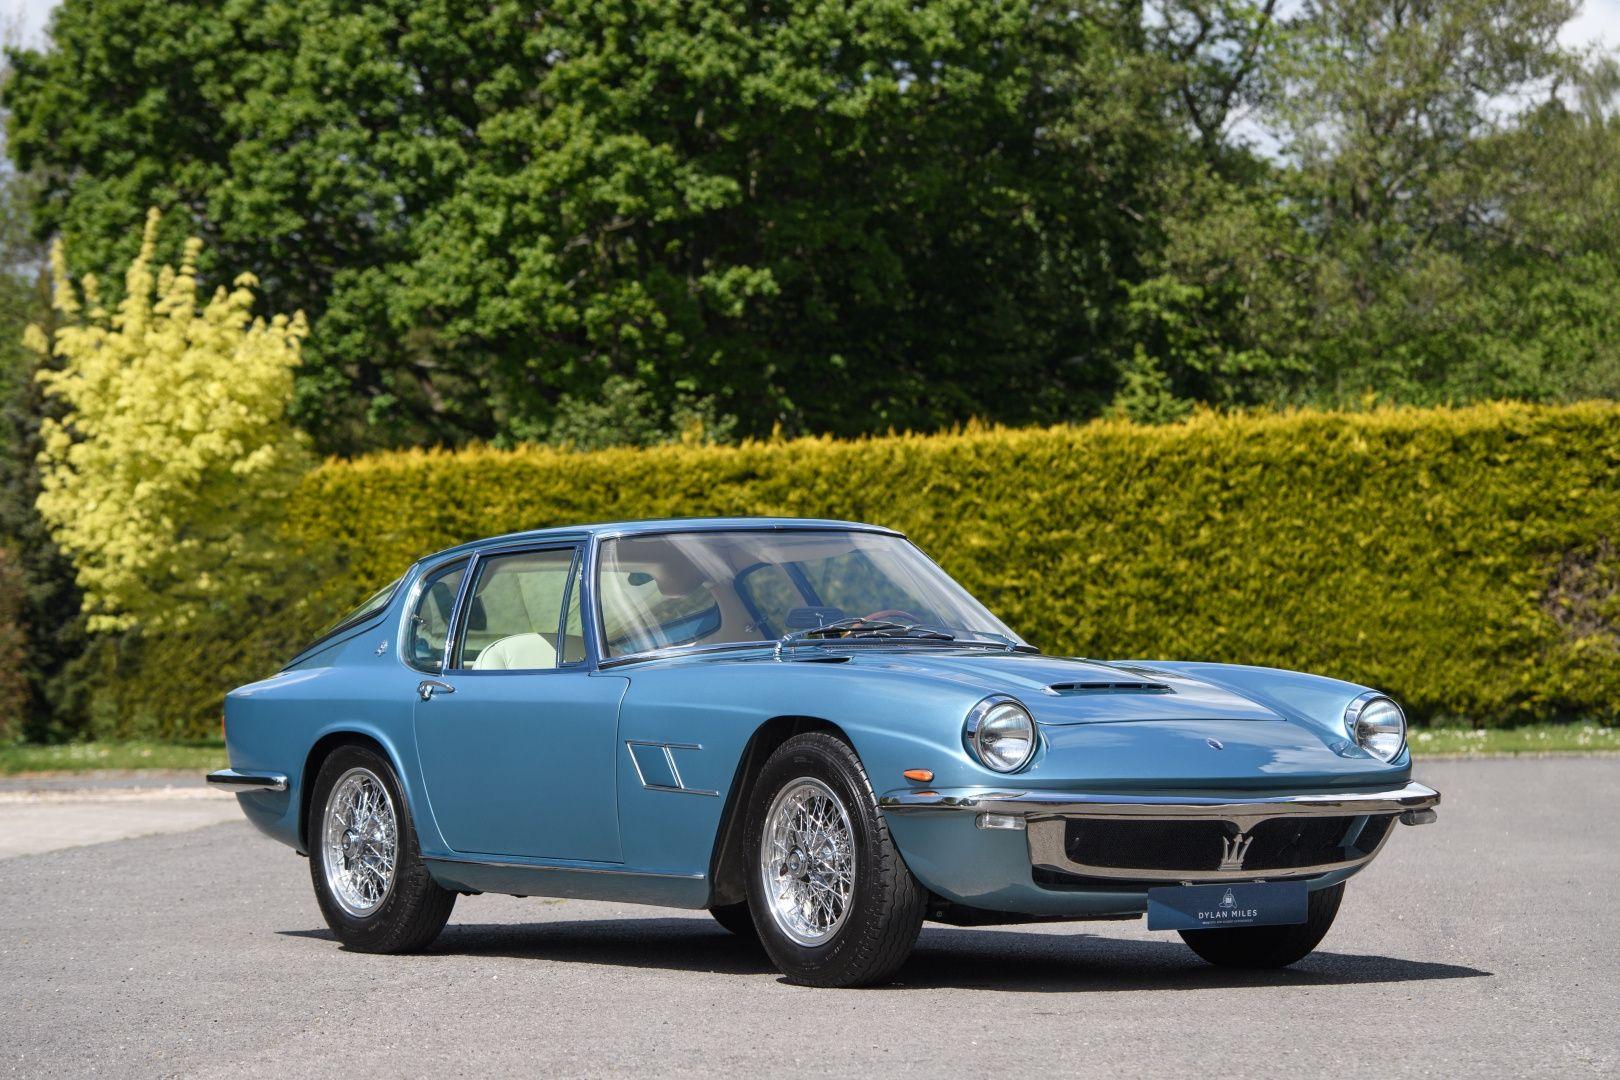 1965 Maserati Mistral - 3700 Coupe - European Delivered ...